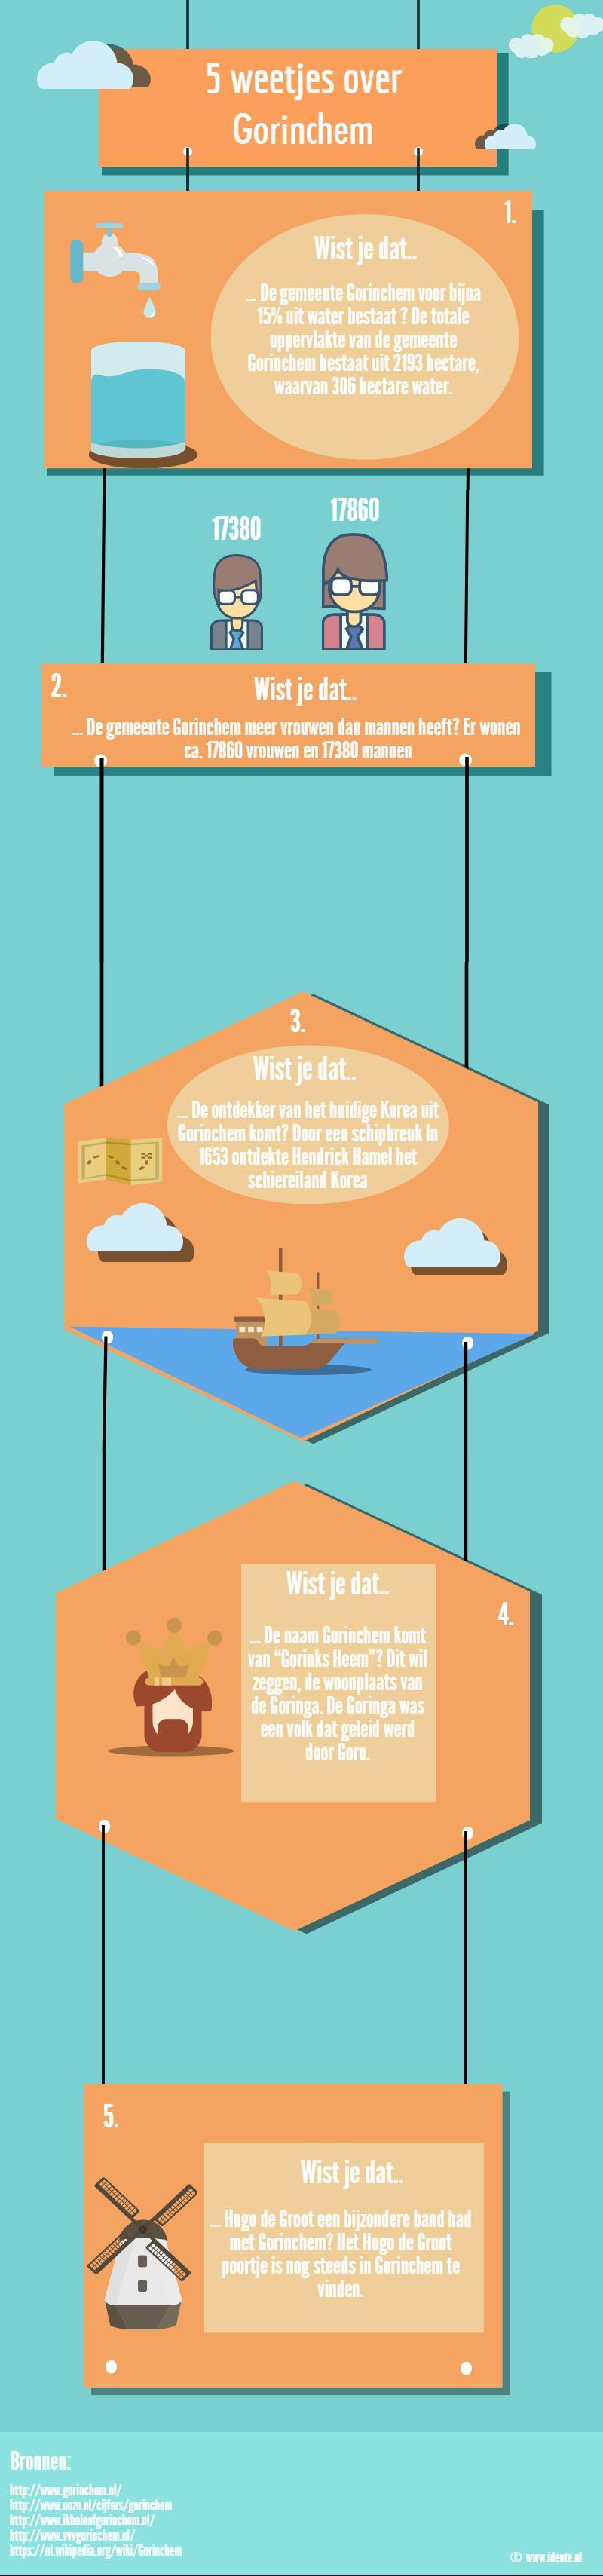 Infographic: 5 weetjes over Gorinchem